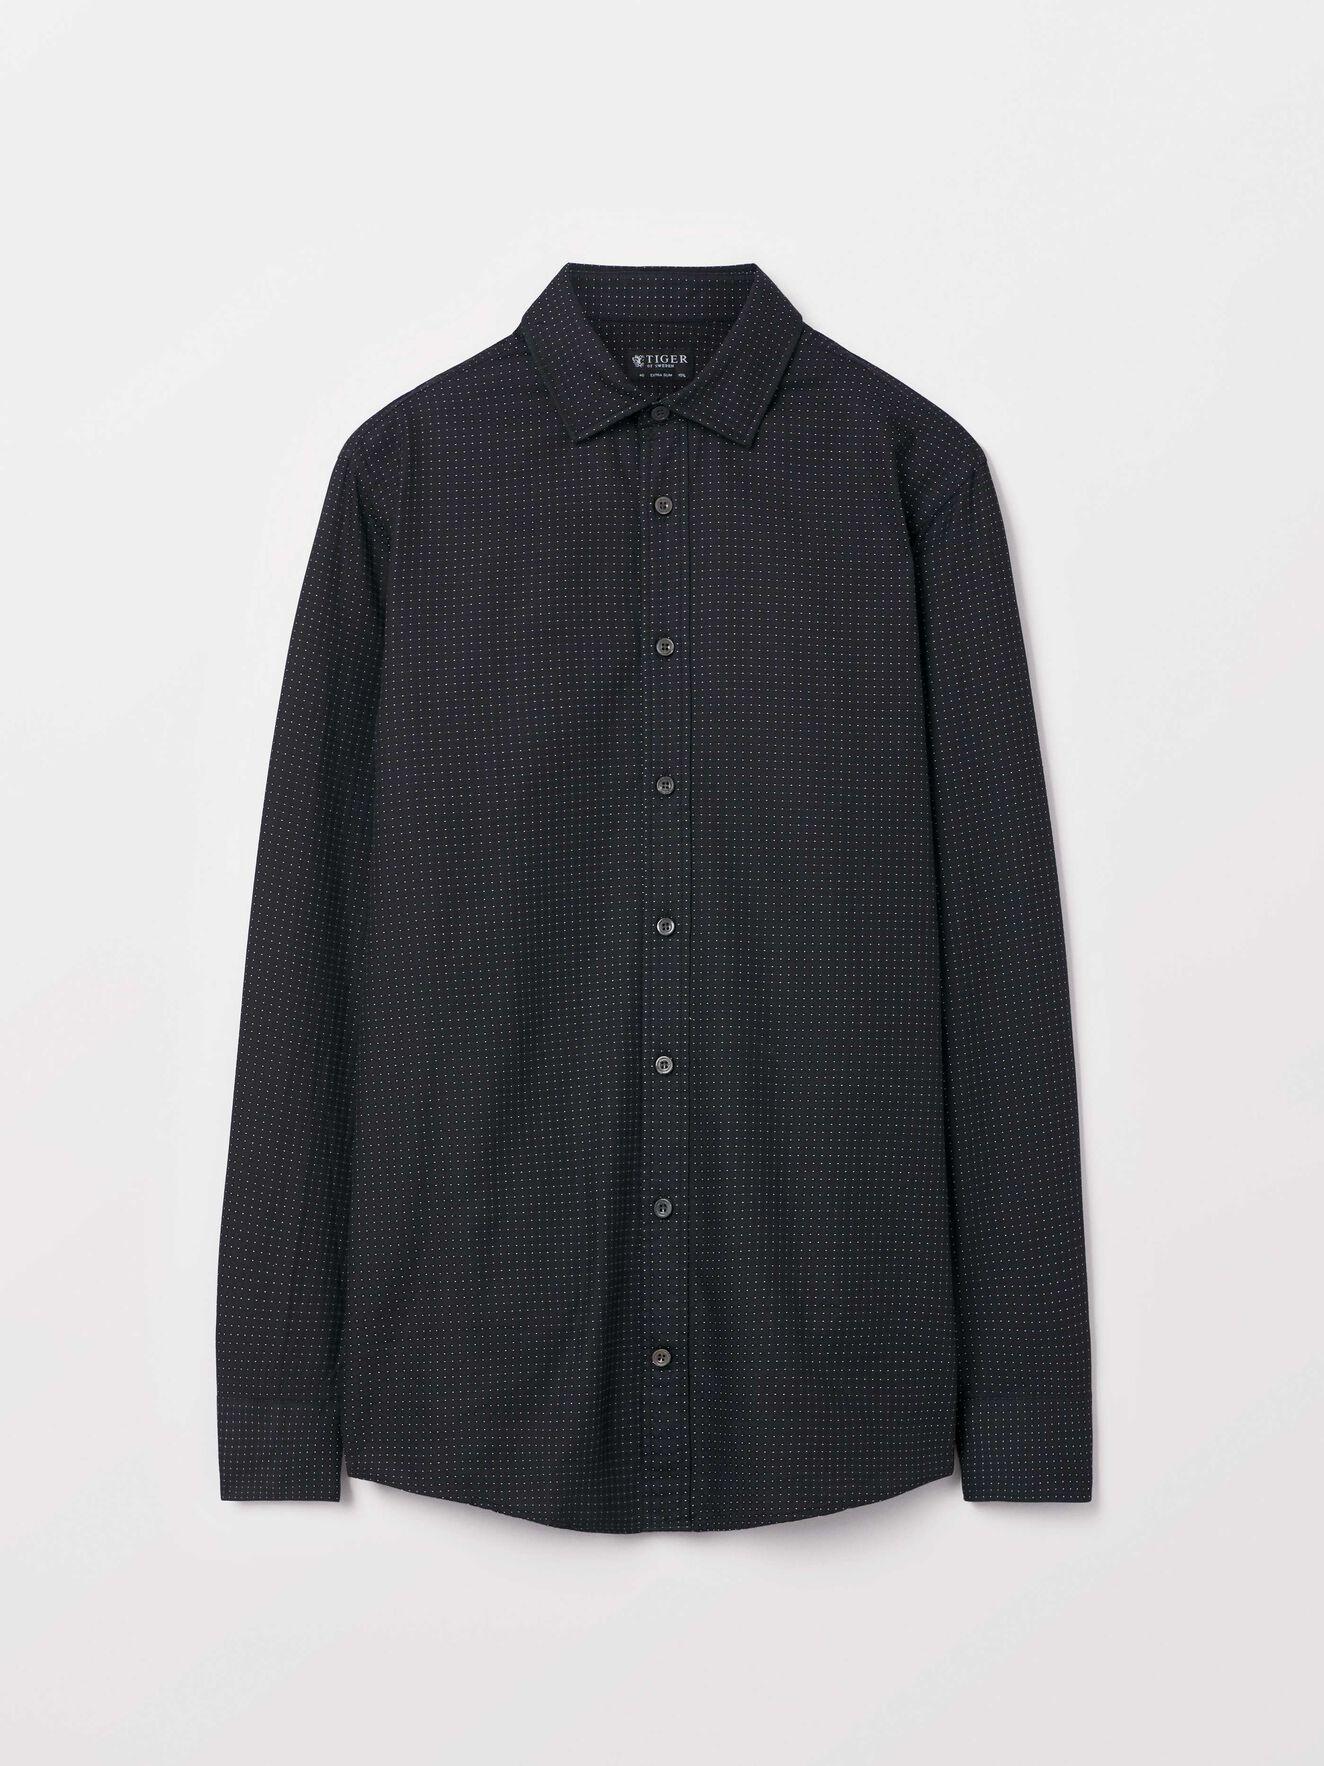 Fridolf Shirt in Black from Tiger of Sweden